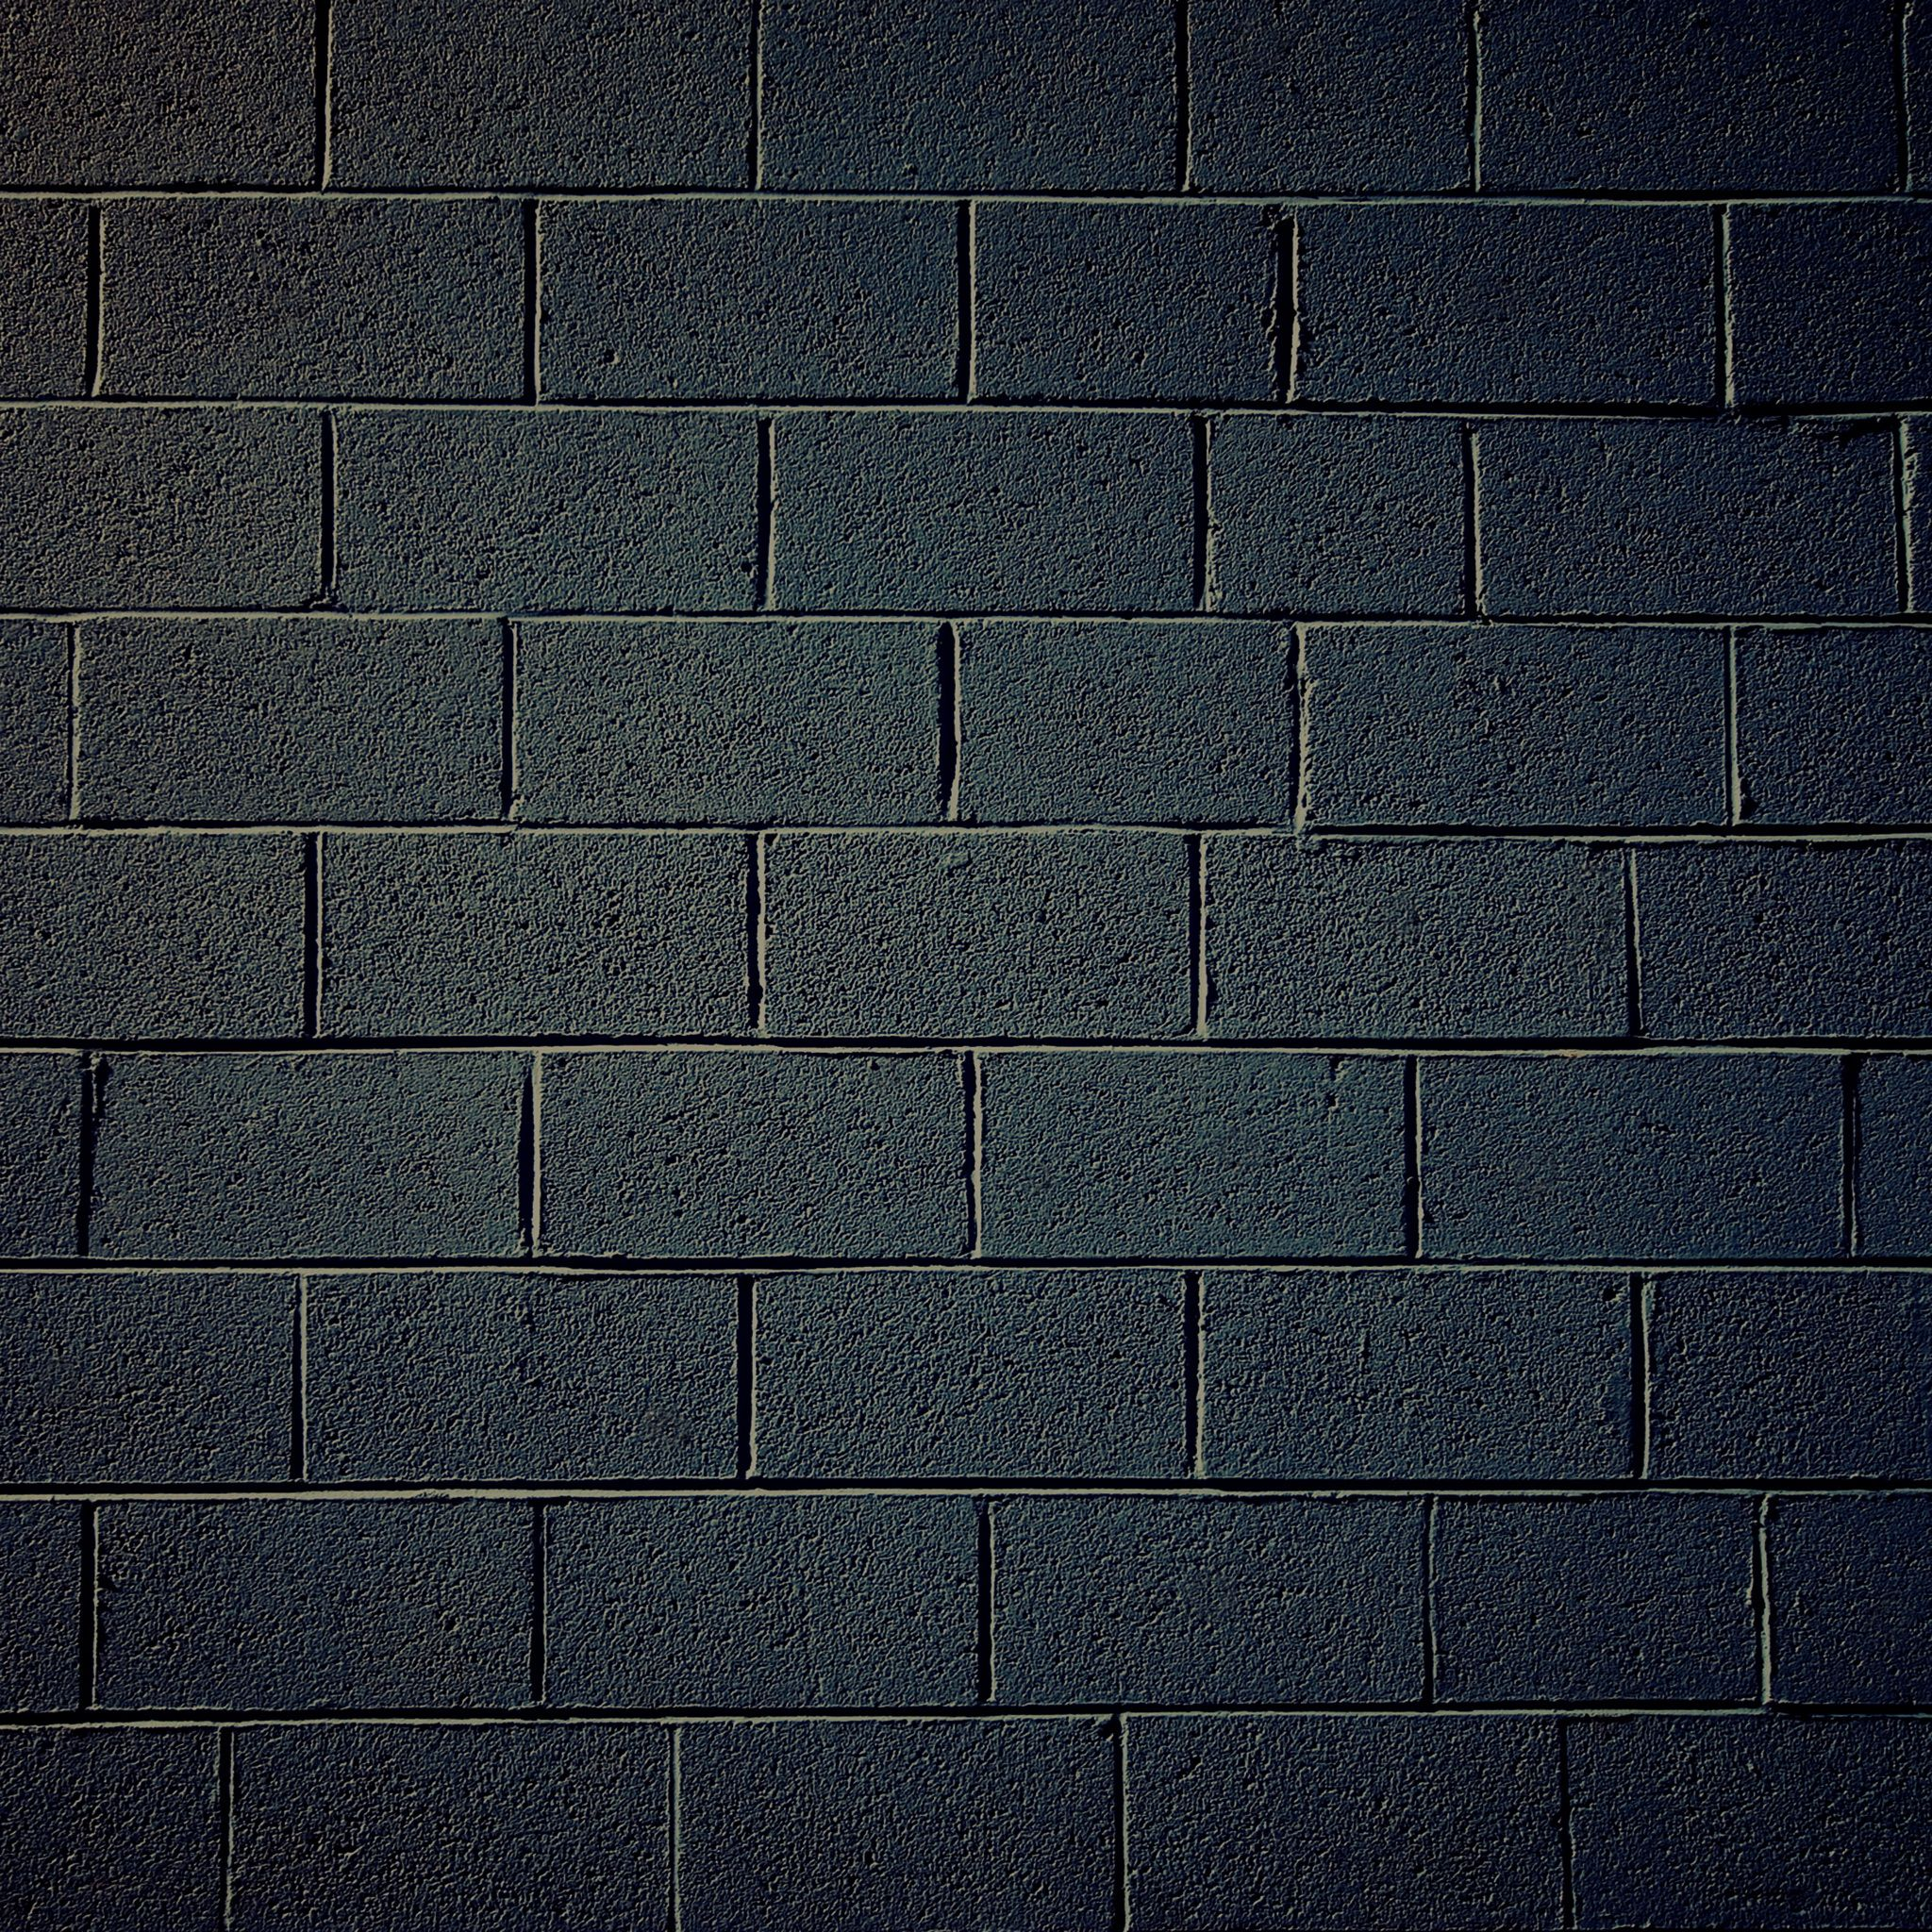 Brick Wall Todays New IPad Wallpapers 16 12 2012 Ipad Wallpaper Hd 2048